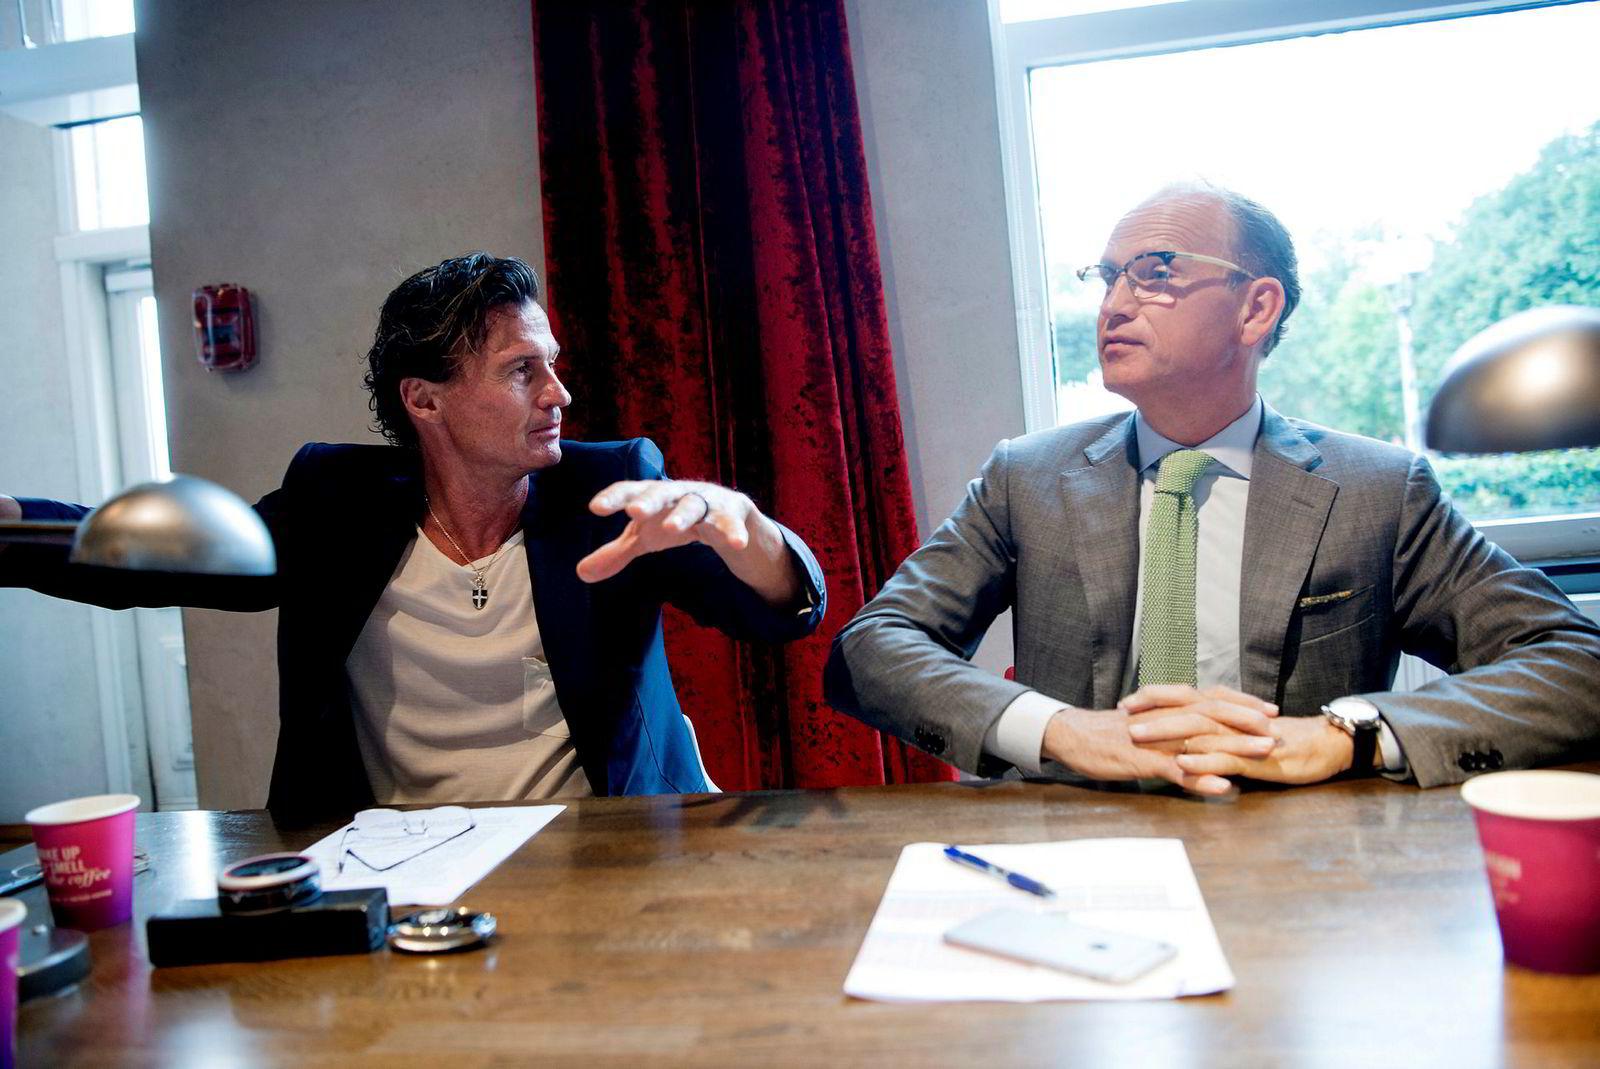 Petter A. Stordalens hotellkjede har tegnet pandemiforsikring med det danske forsikringsselskapet Codan, men har så langt ikke fått en krone. Her sammen med Nordic Choice Hotels-sjef, Torgeir Silseth.